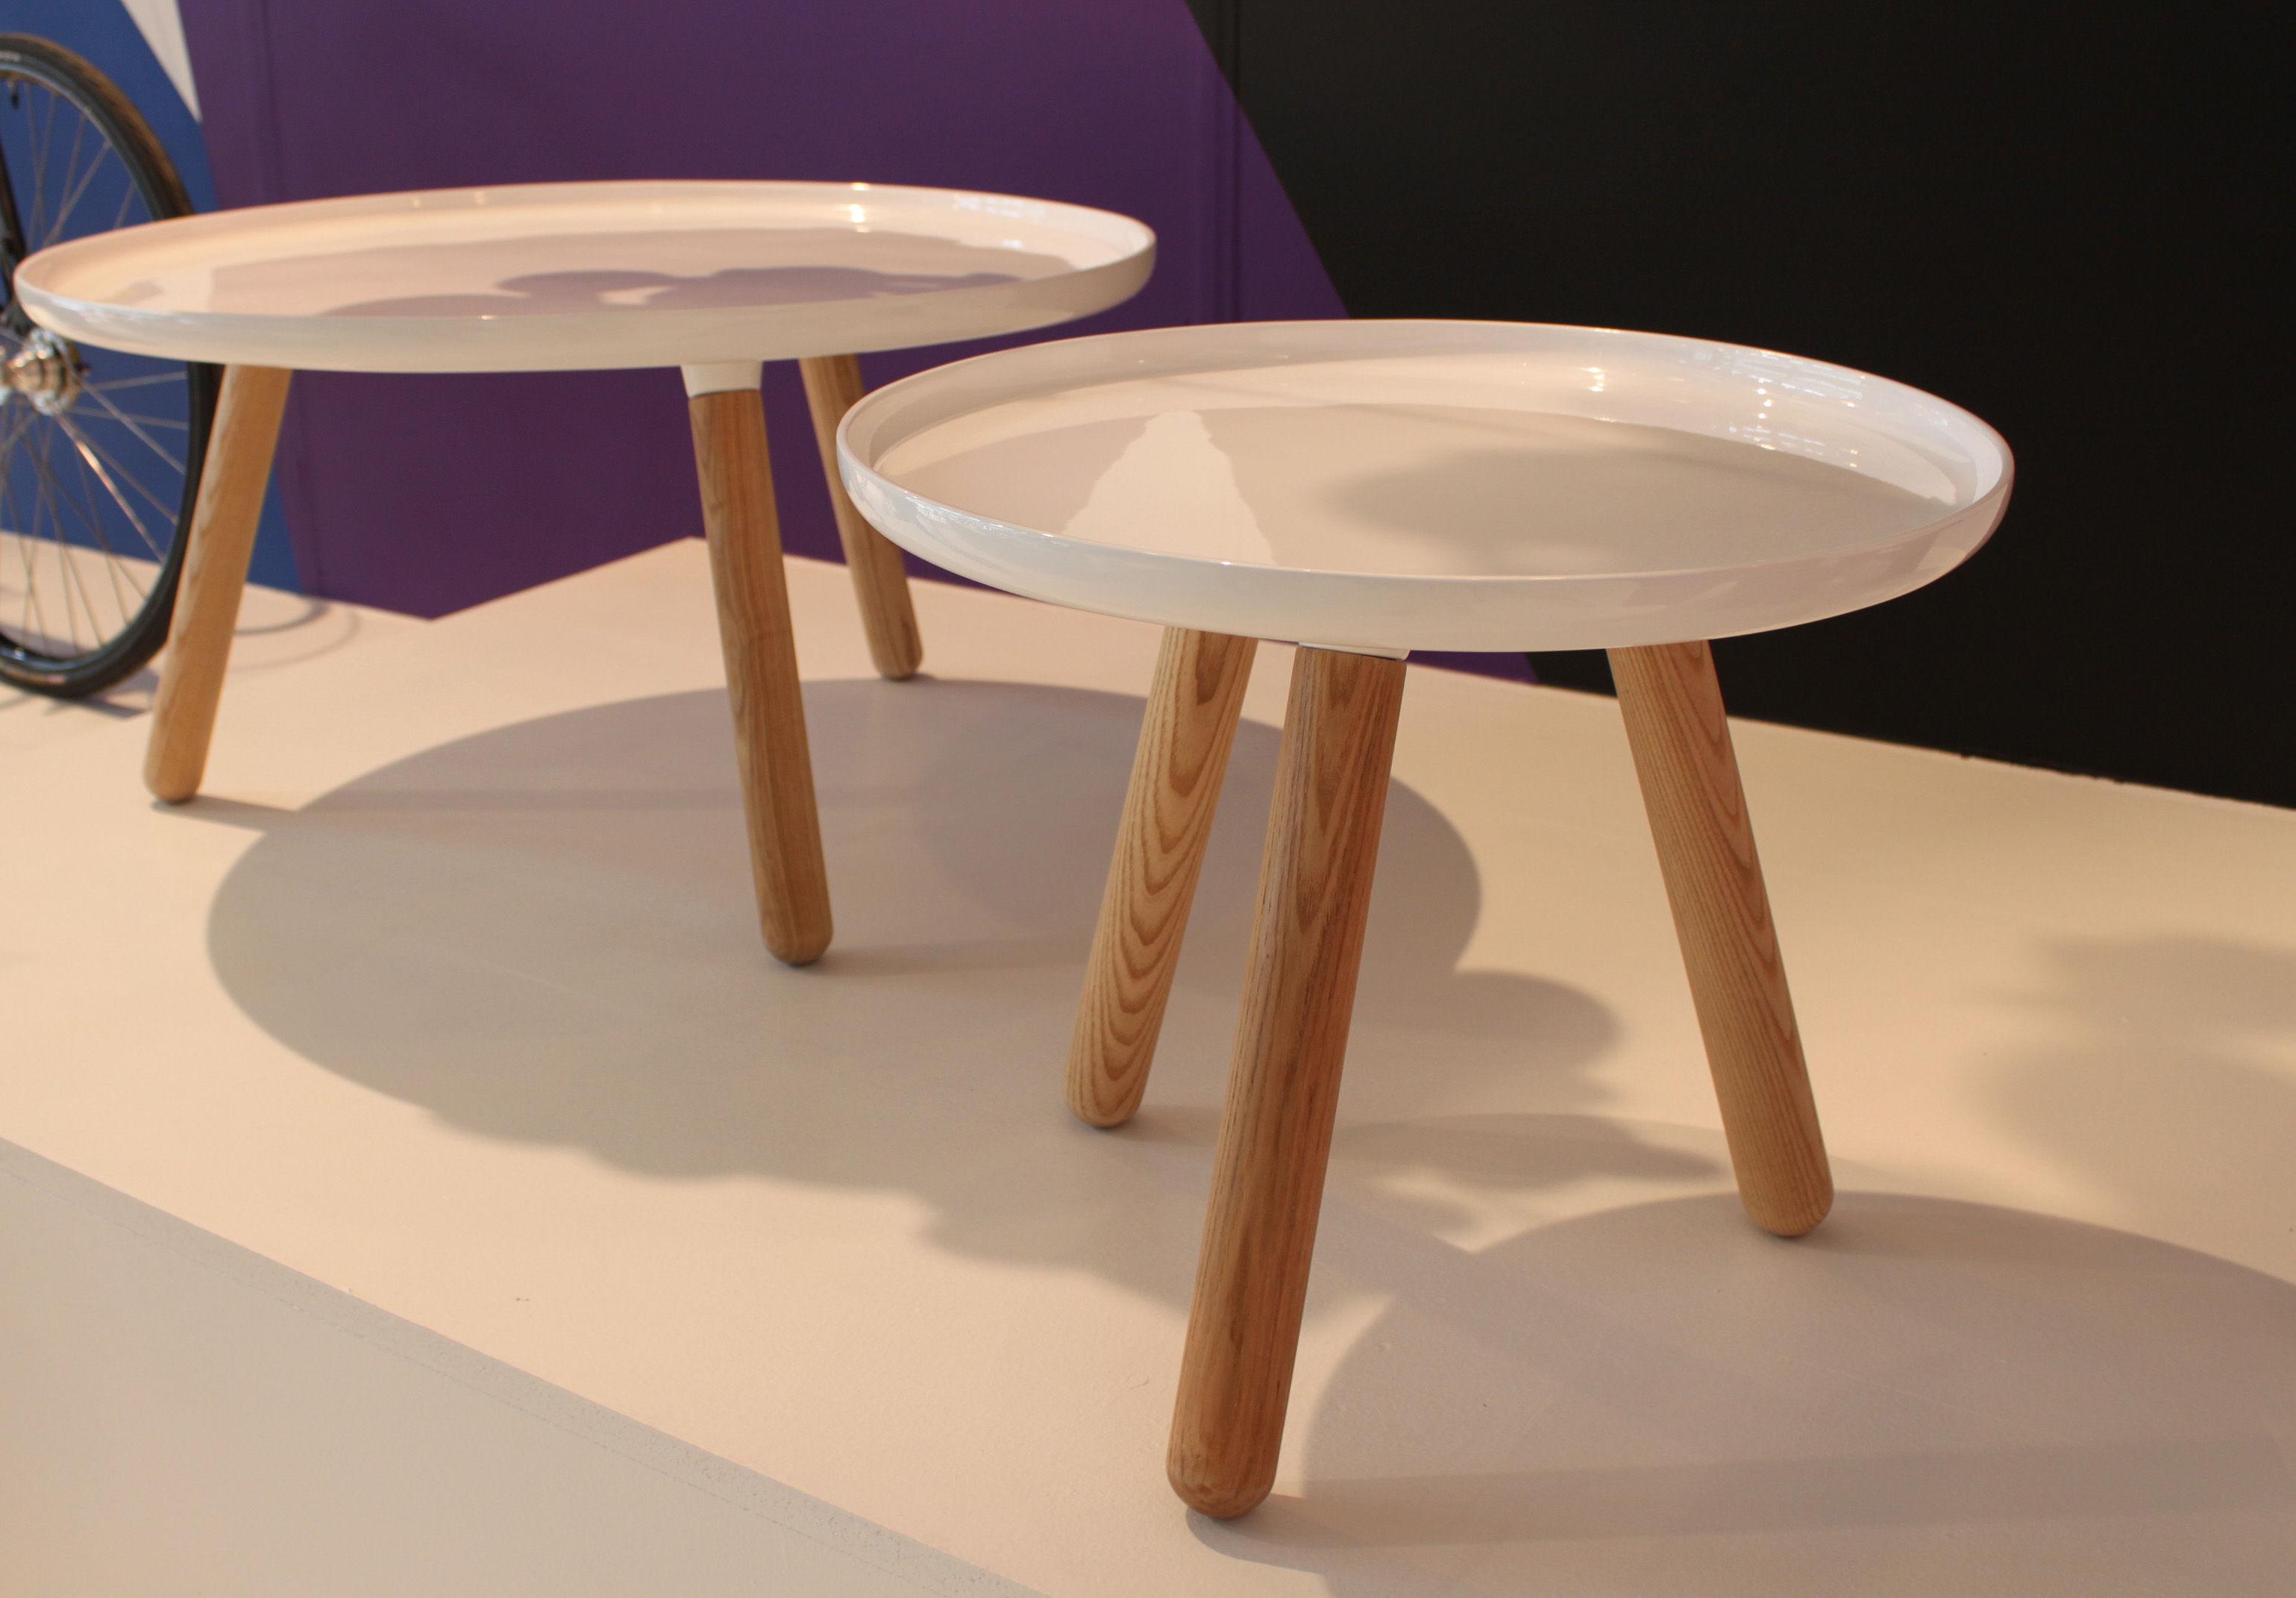 tablo small coffee table 50 cm white by normann copenhagen. Black Bedroom Furniture Sets. Home Design Ideas